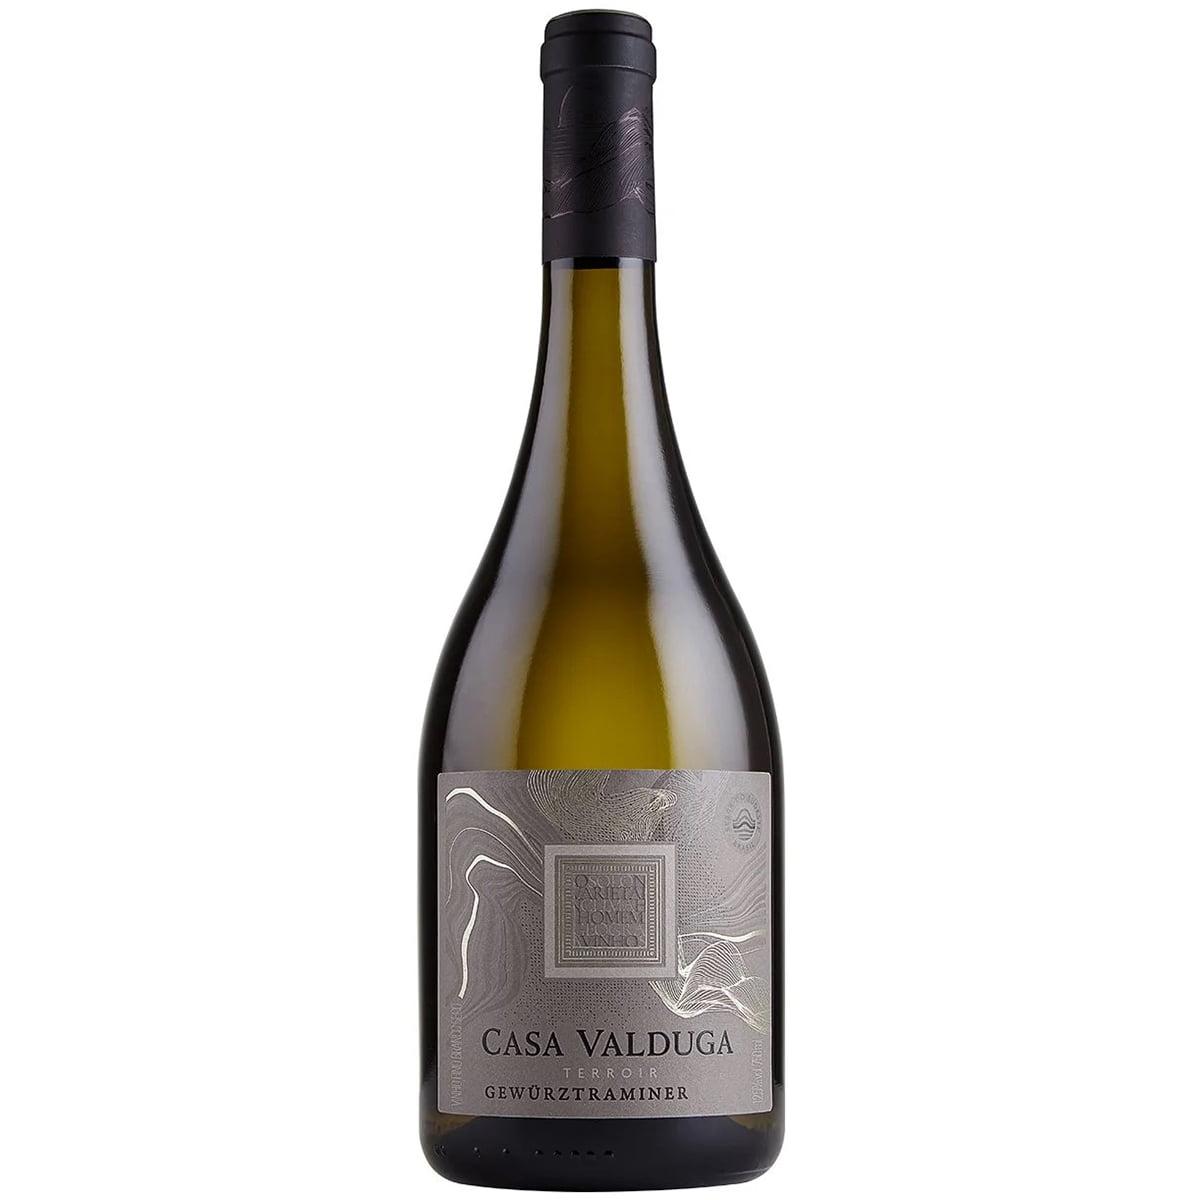 Vinho Casa Valduga Terroir Gewurztraminer Branco 750ml